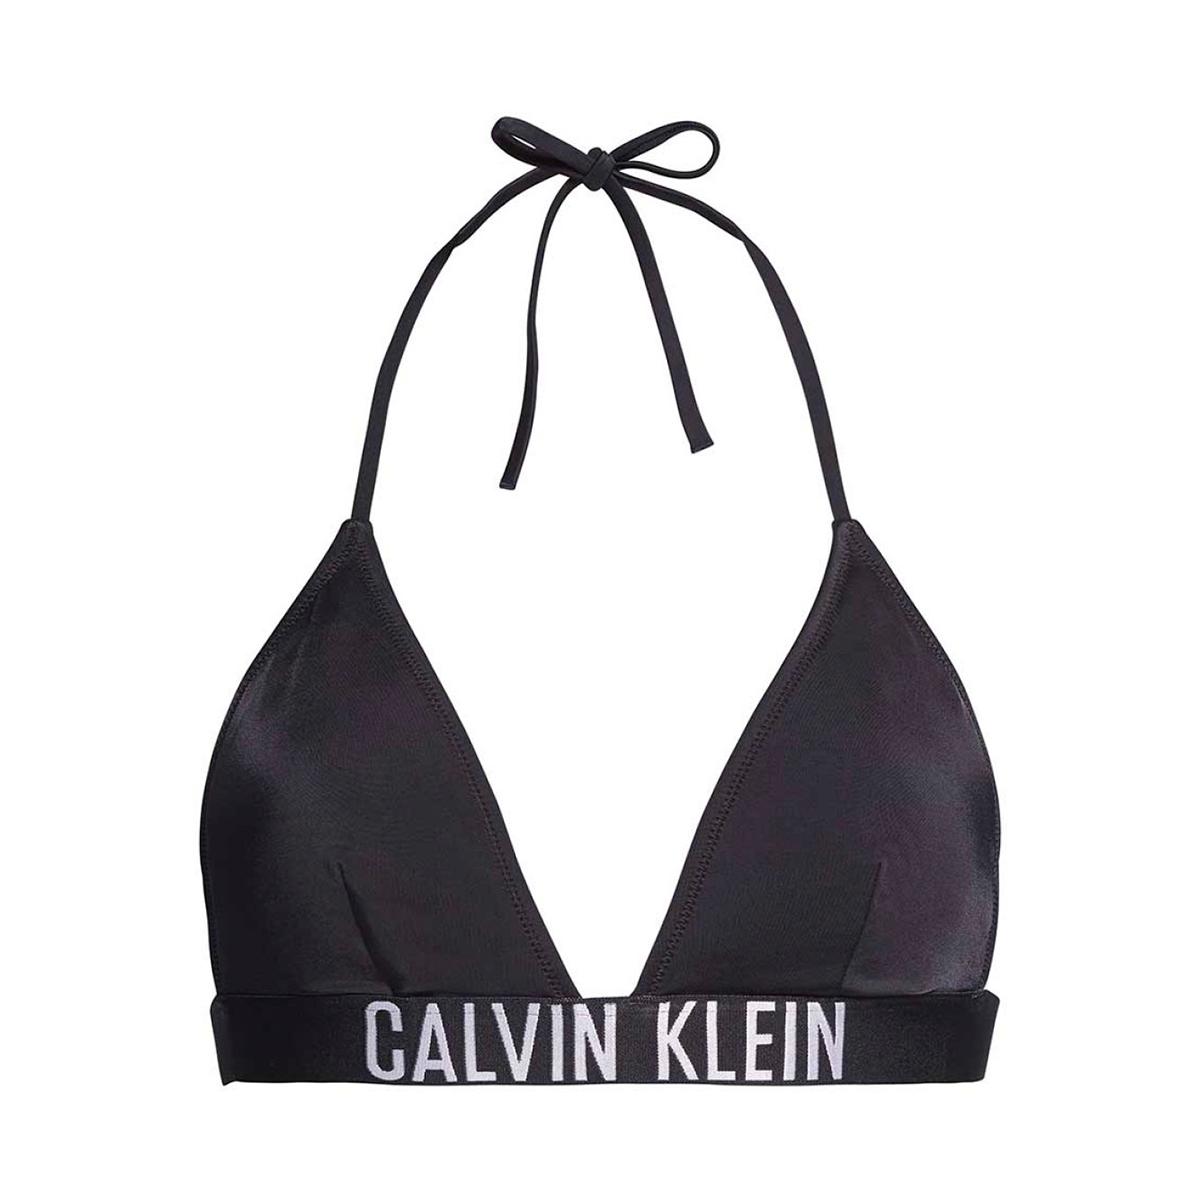 Image of   CALVIN KLEIN BIKINI TRIANGLE 00883 BEH (Black, L)